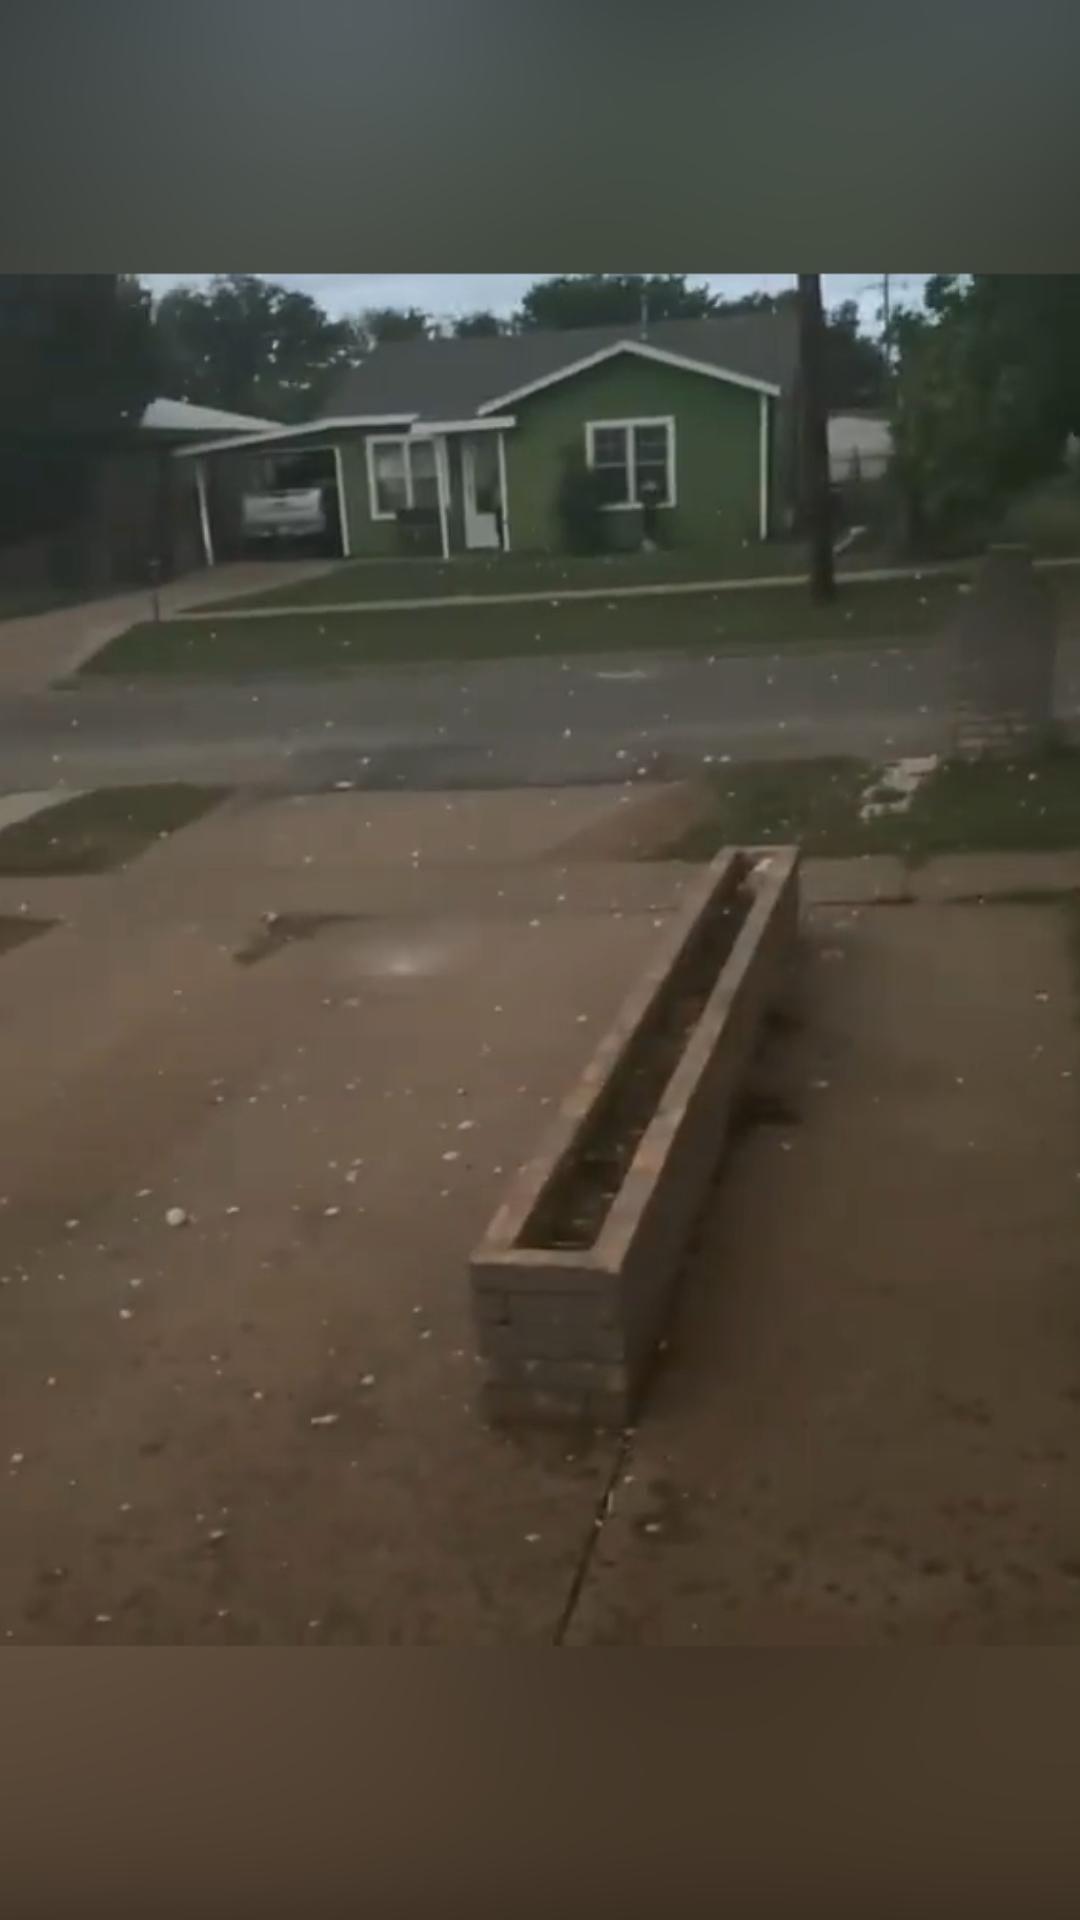 hail in Texas. 😳 [via @sjasso23]